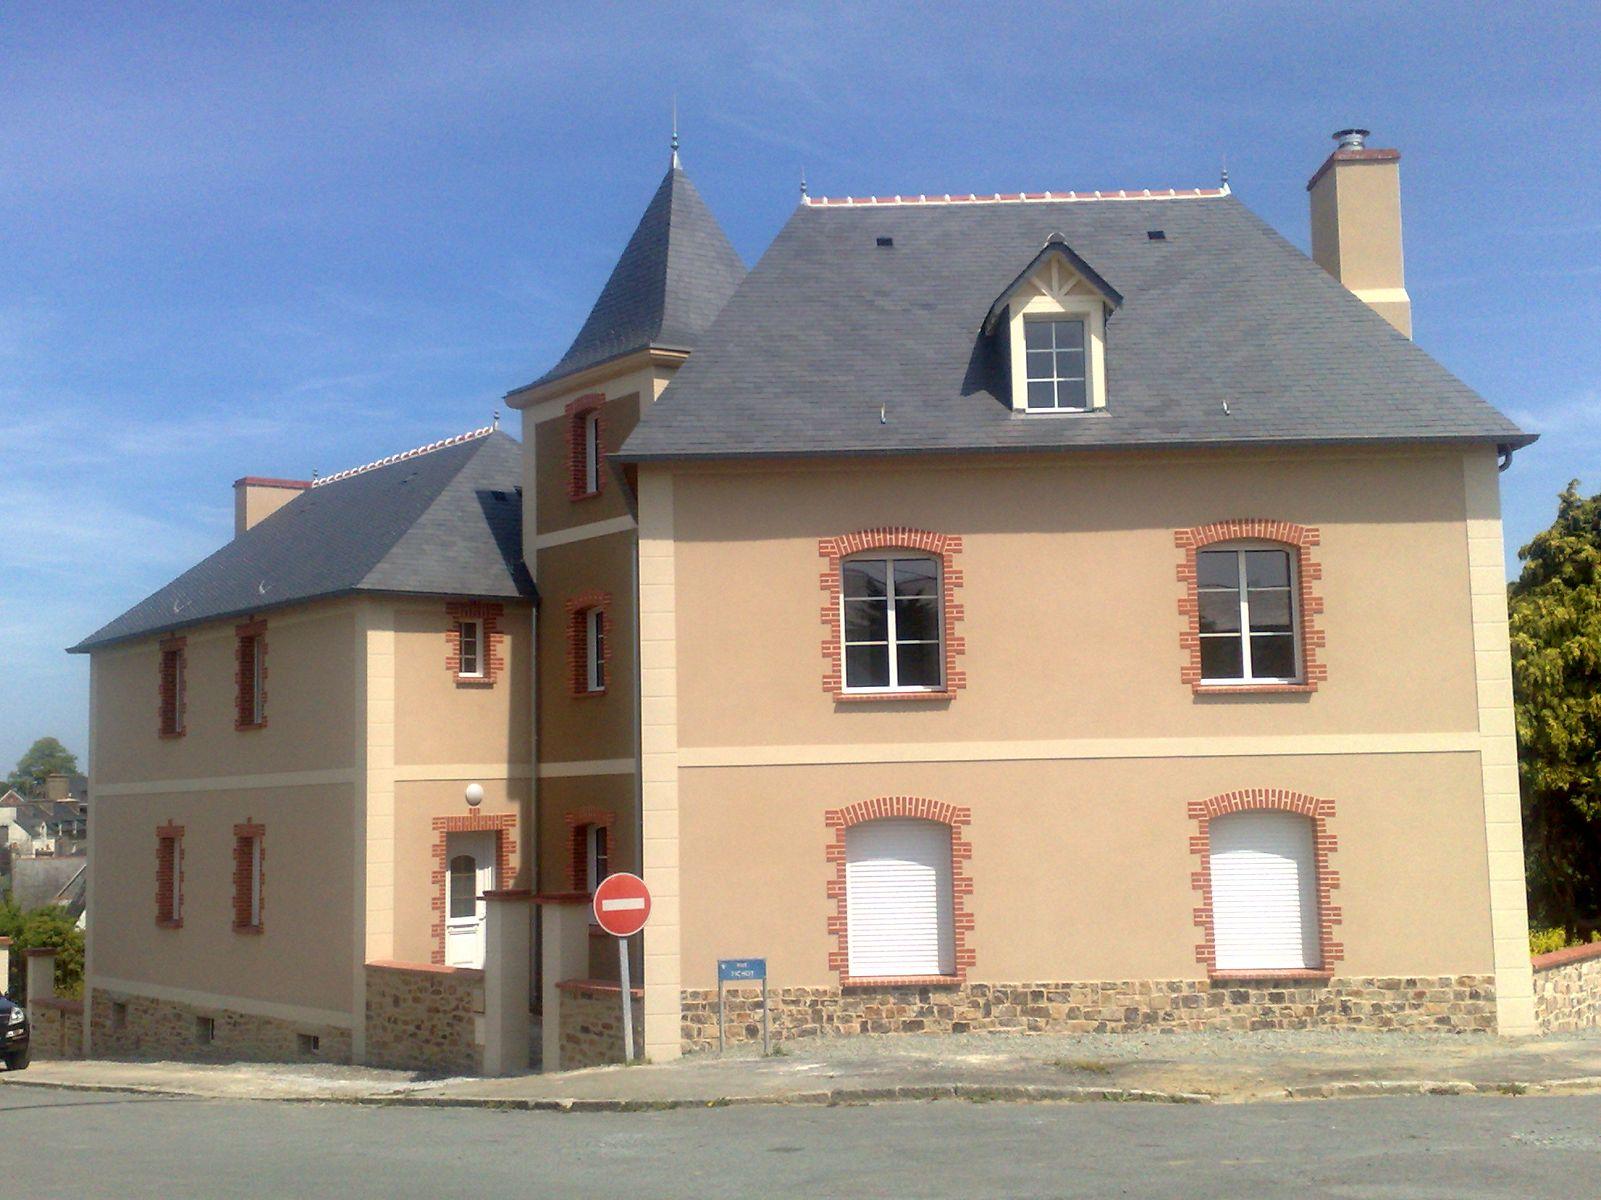 Restauration Maison Ancienne Bretagne Asnieres Sur Seine